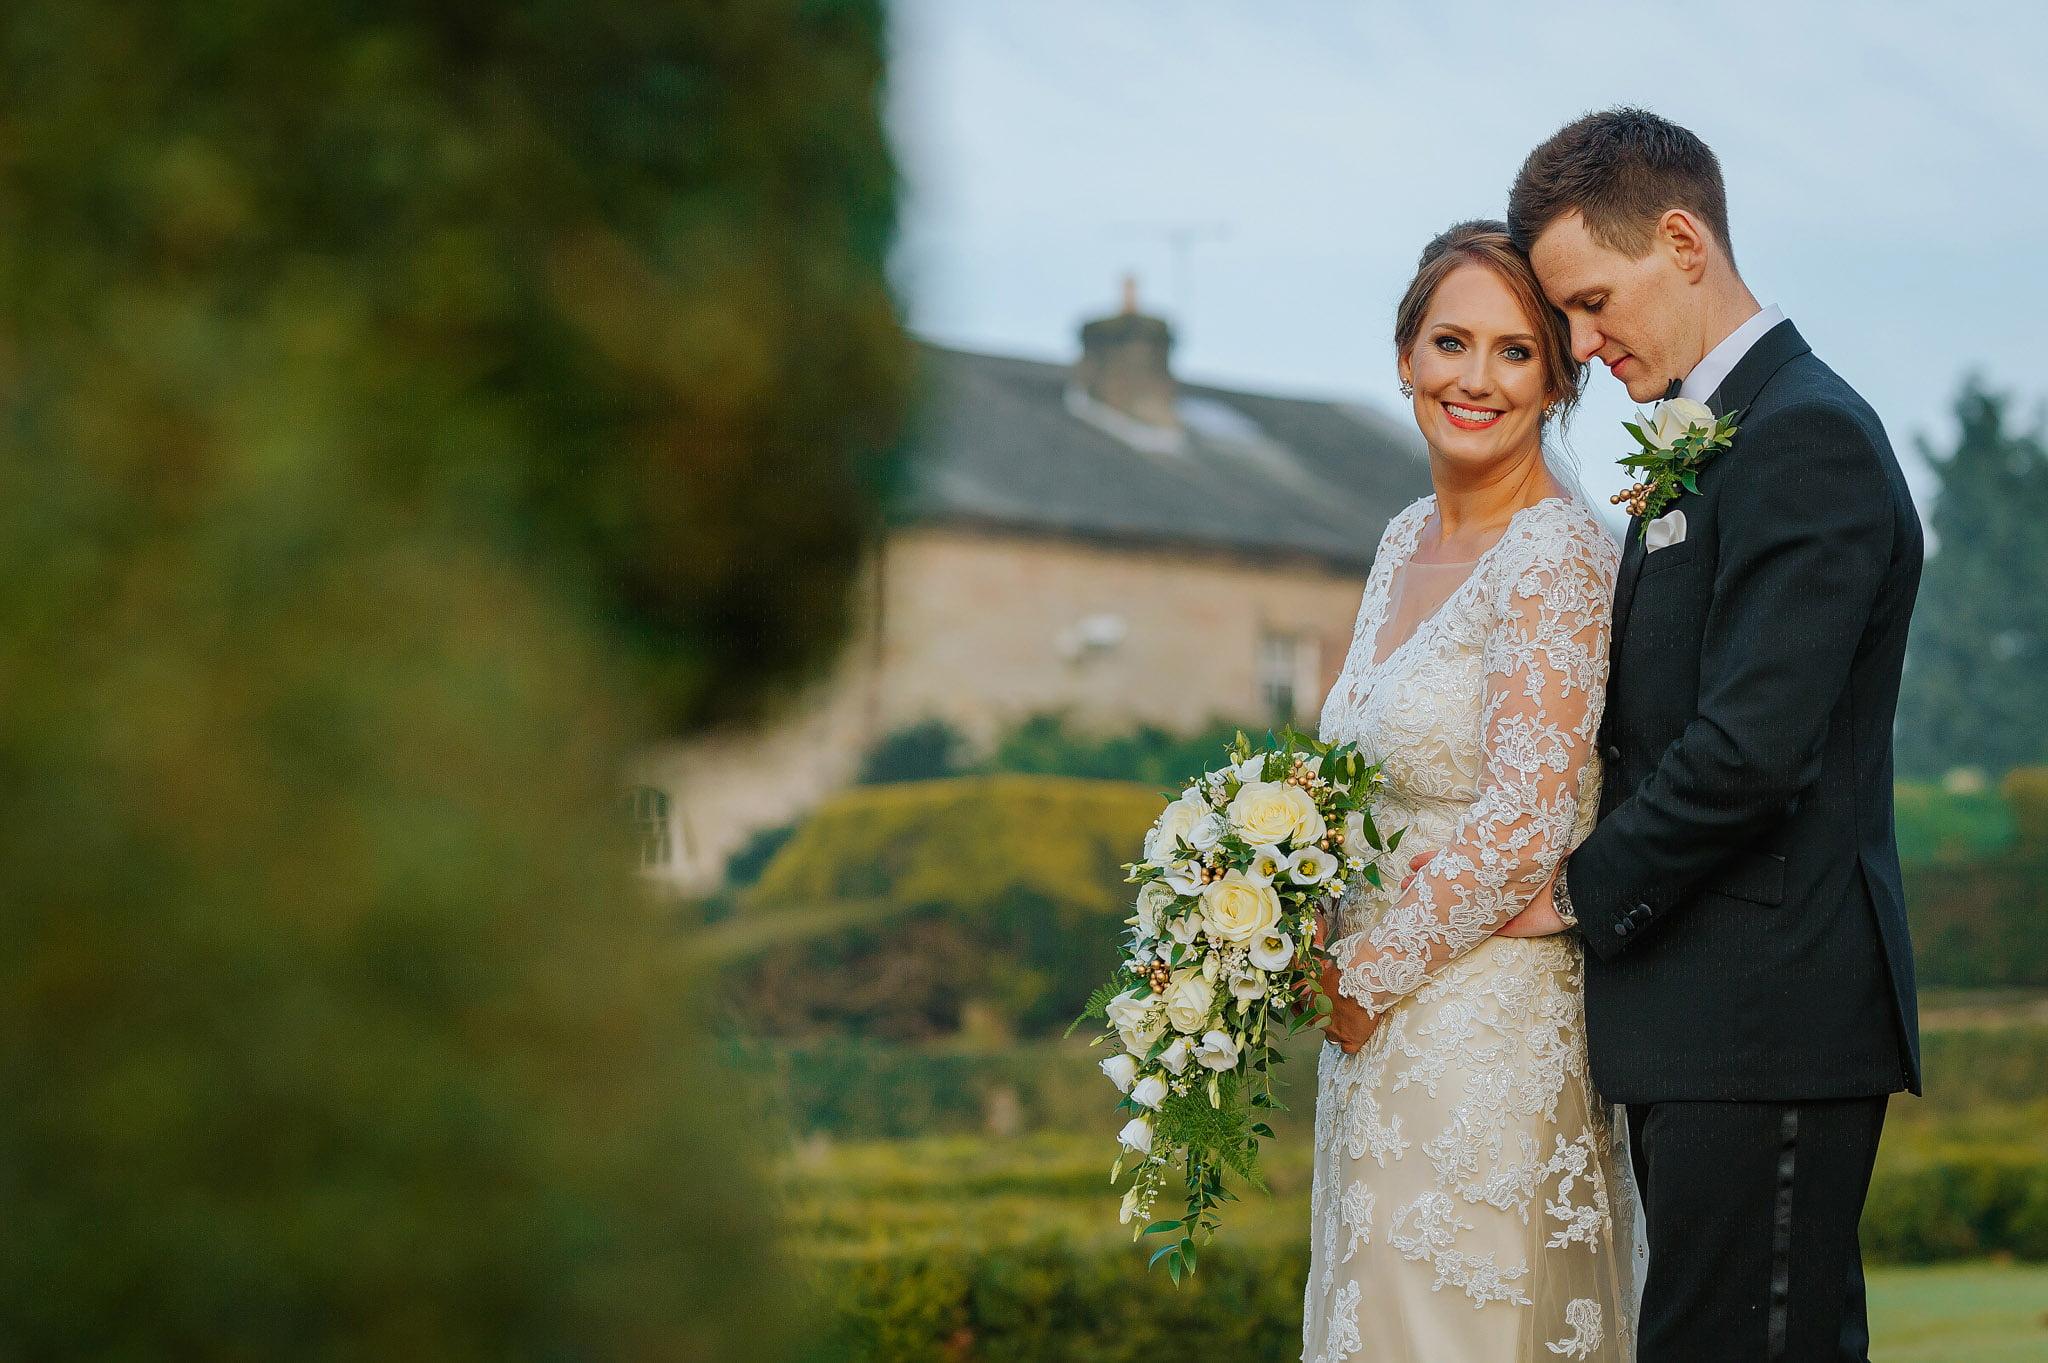 Coombe Abbey wedding in Coventry, Warwickshire - Sam + Matt 54